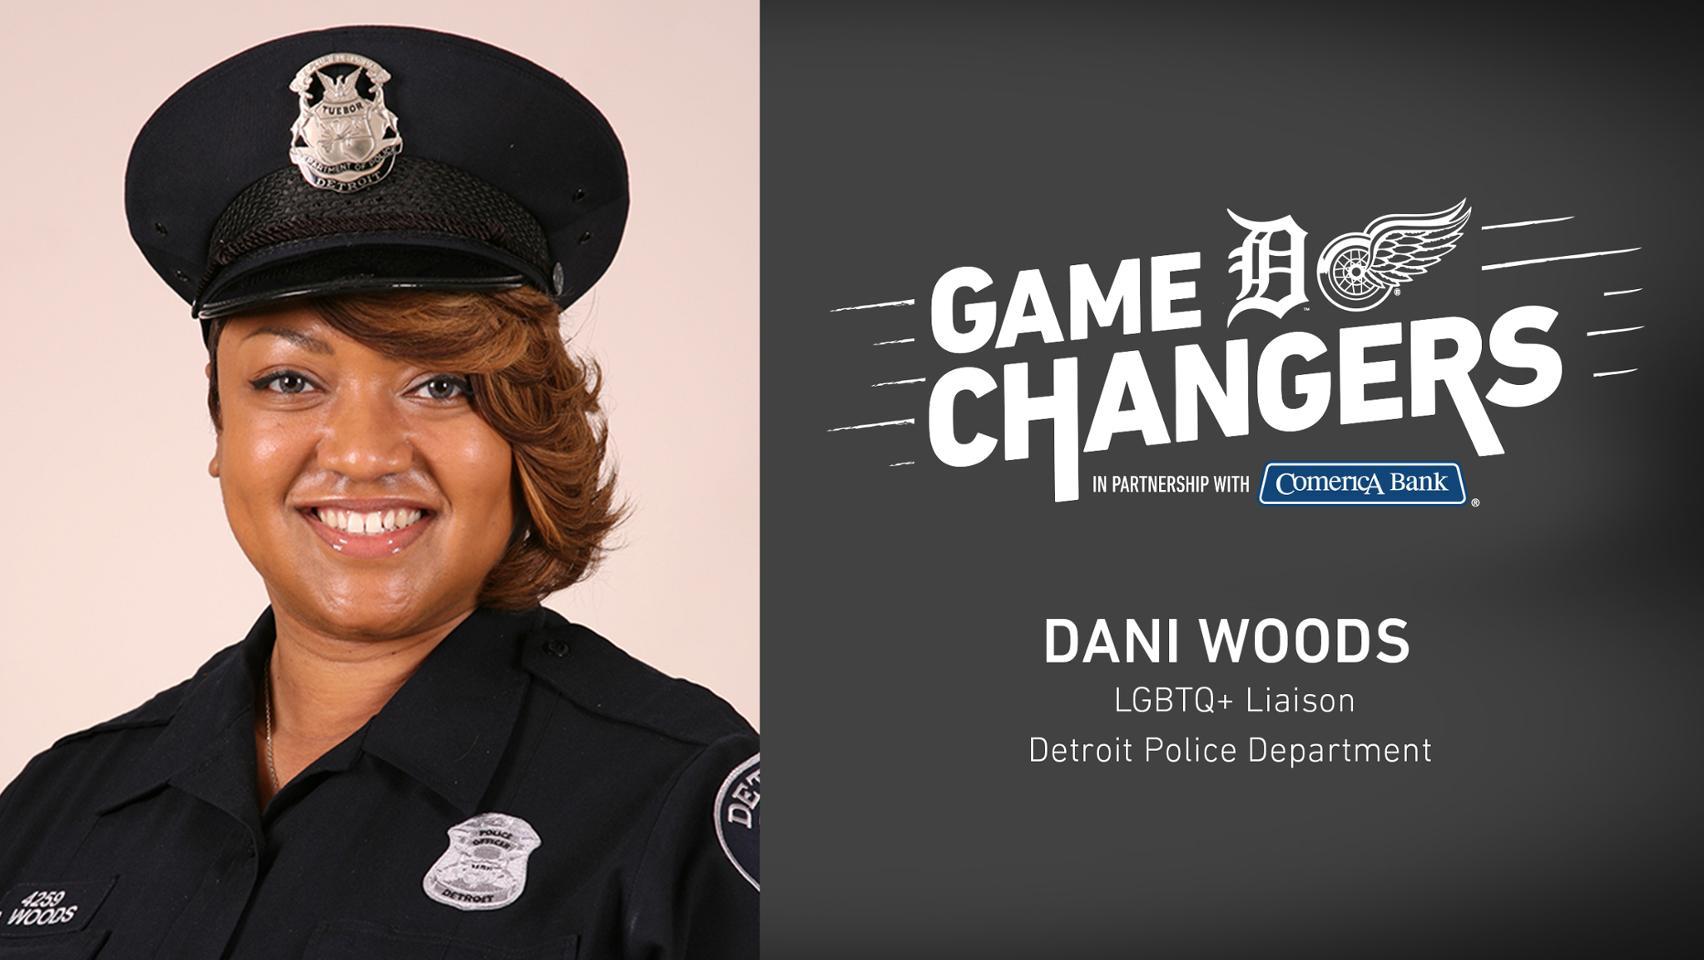 Dani Woods